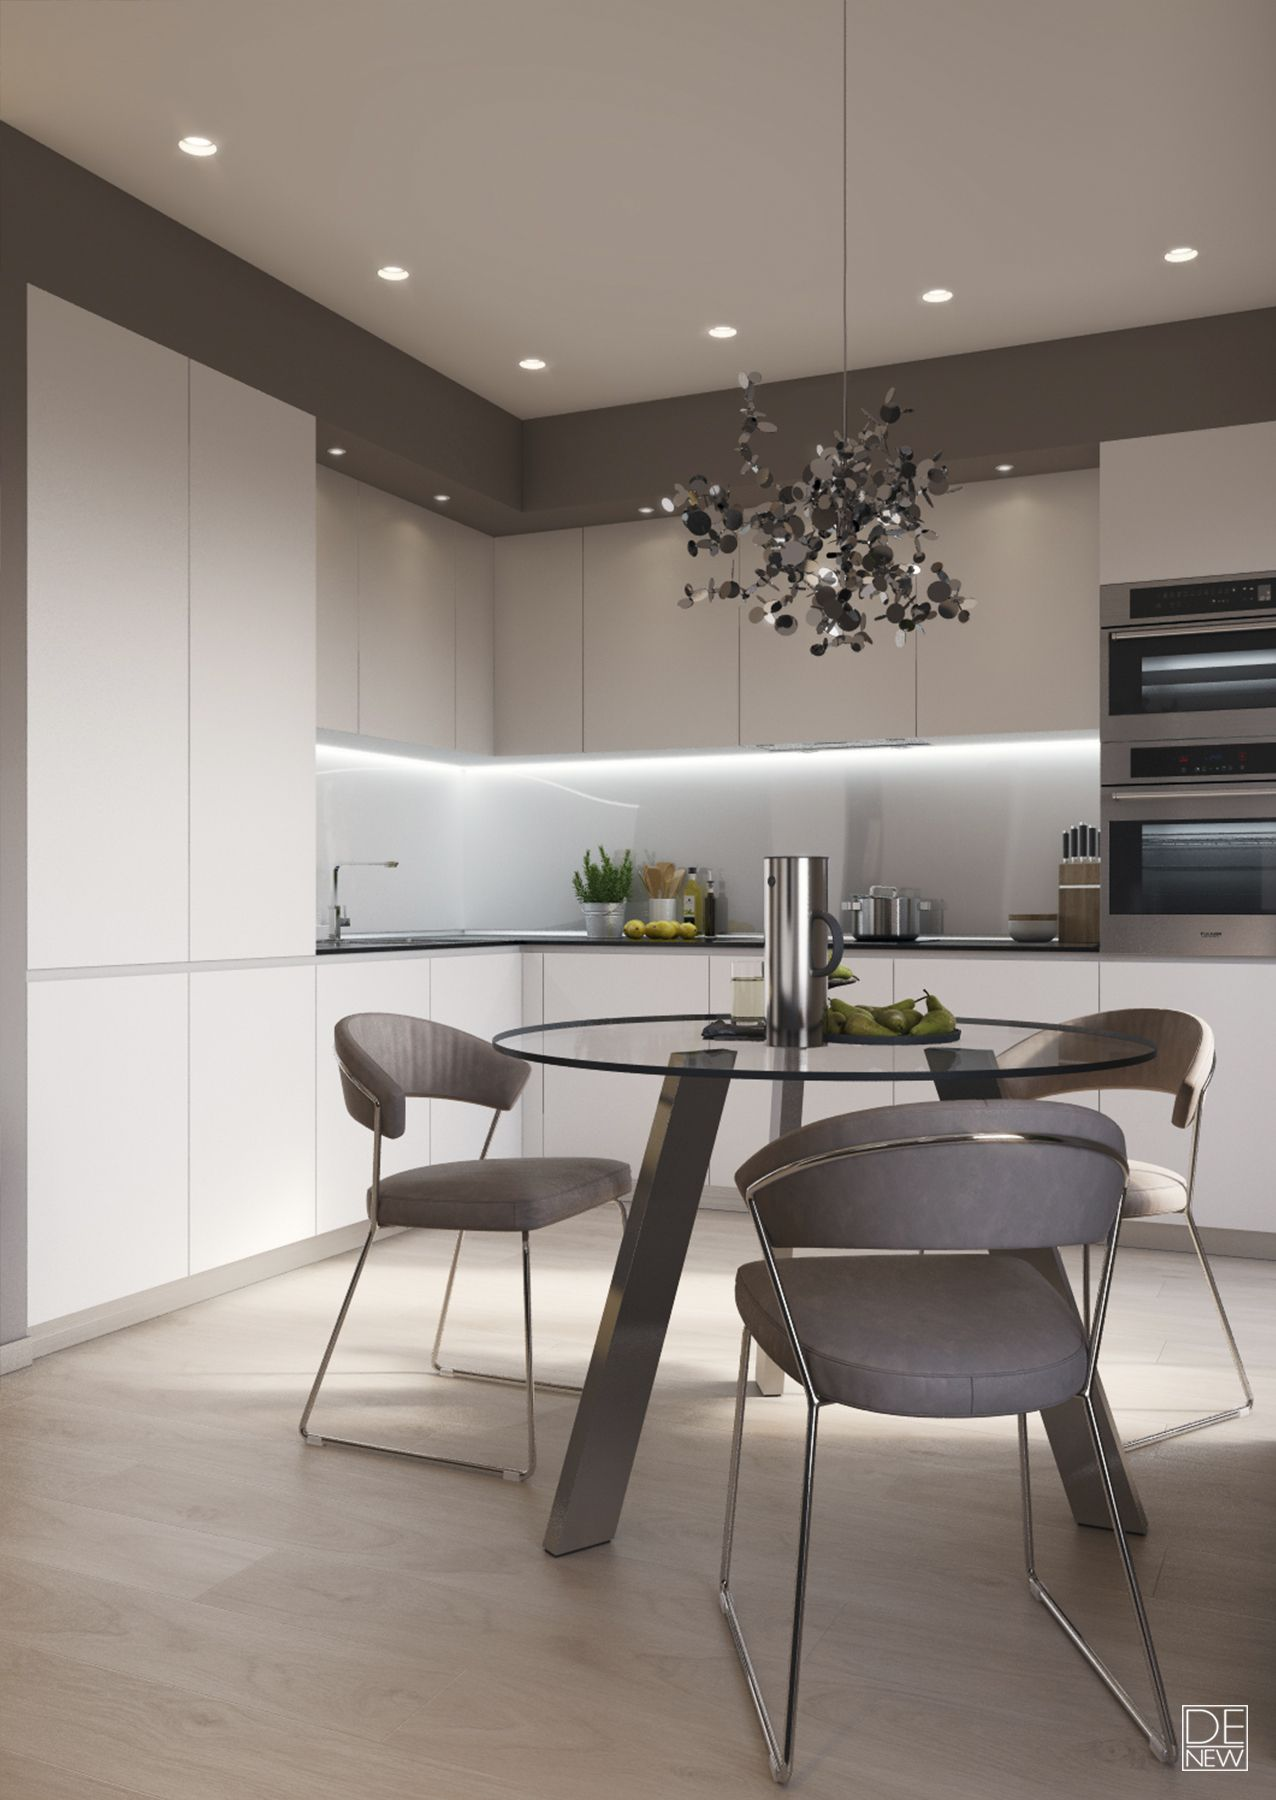 5aea32cac504 ОСТРОВСКОГО Pranzo Cucina, Design Cucine, Design Appartamenti,  Elettrodomestici